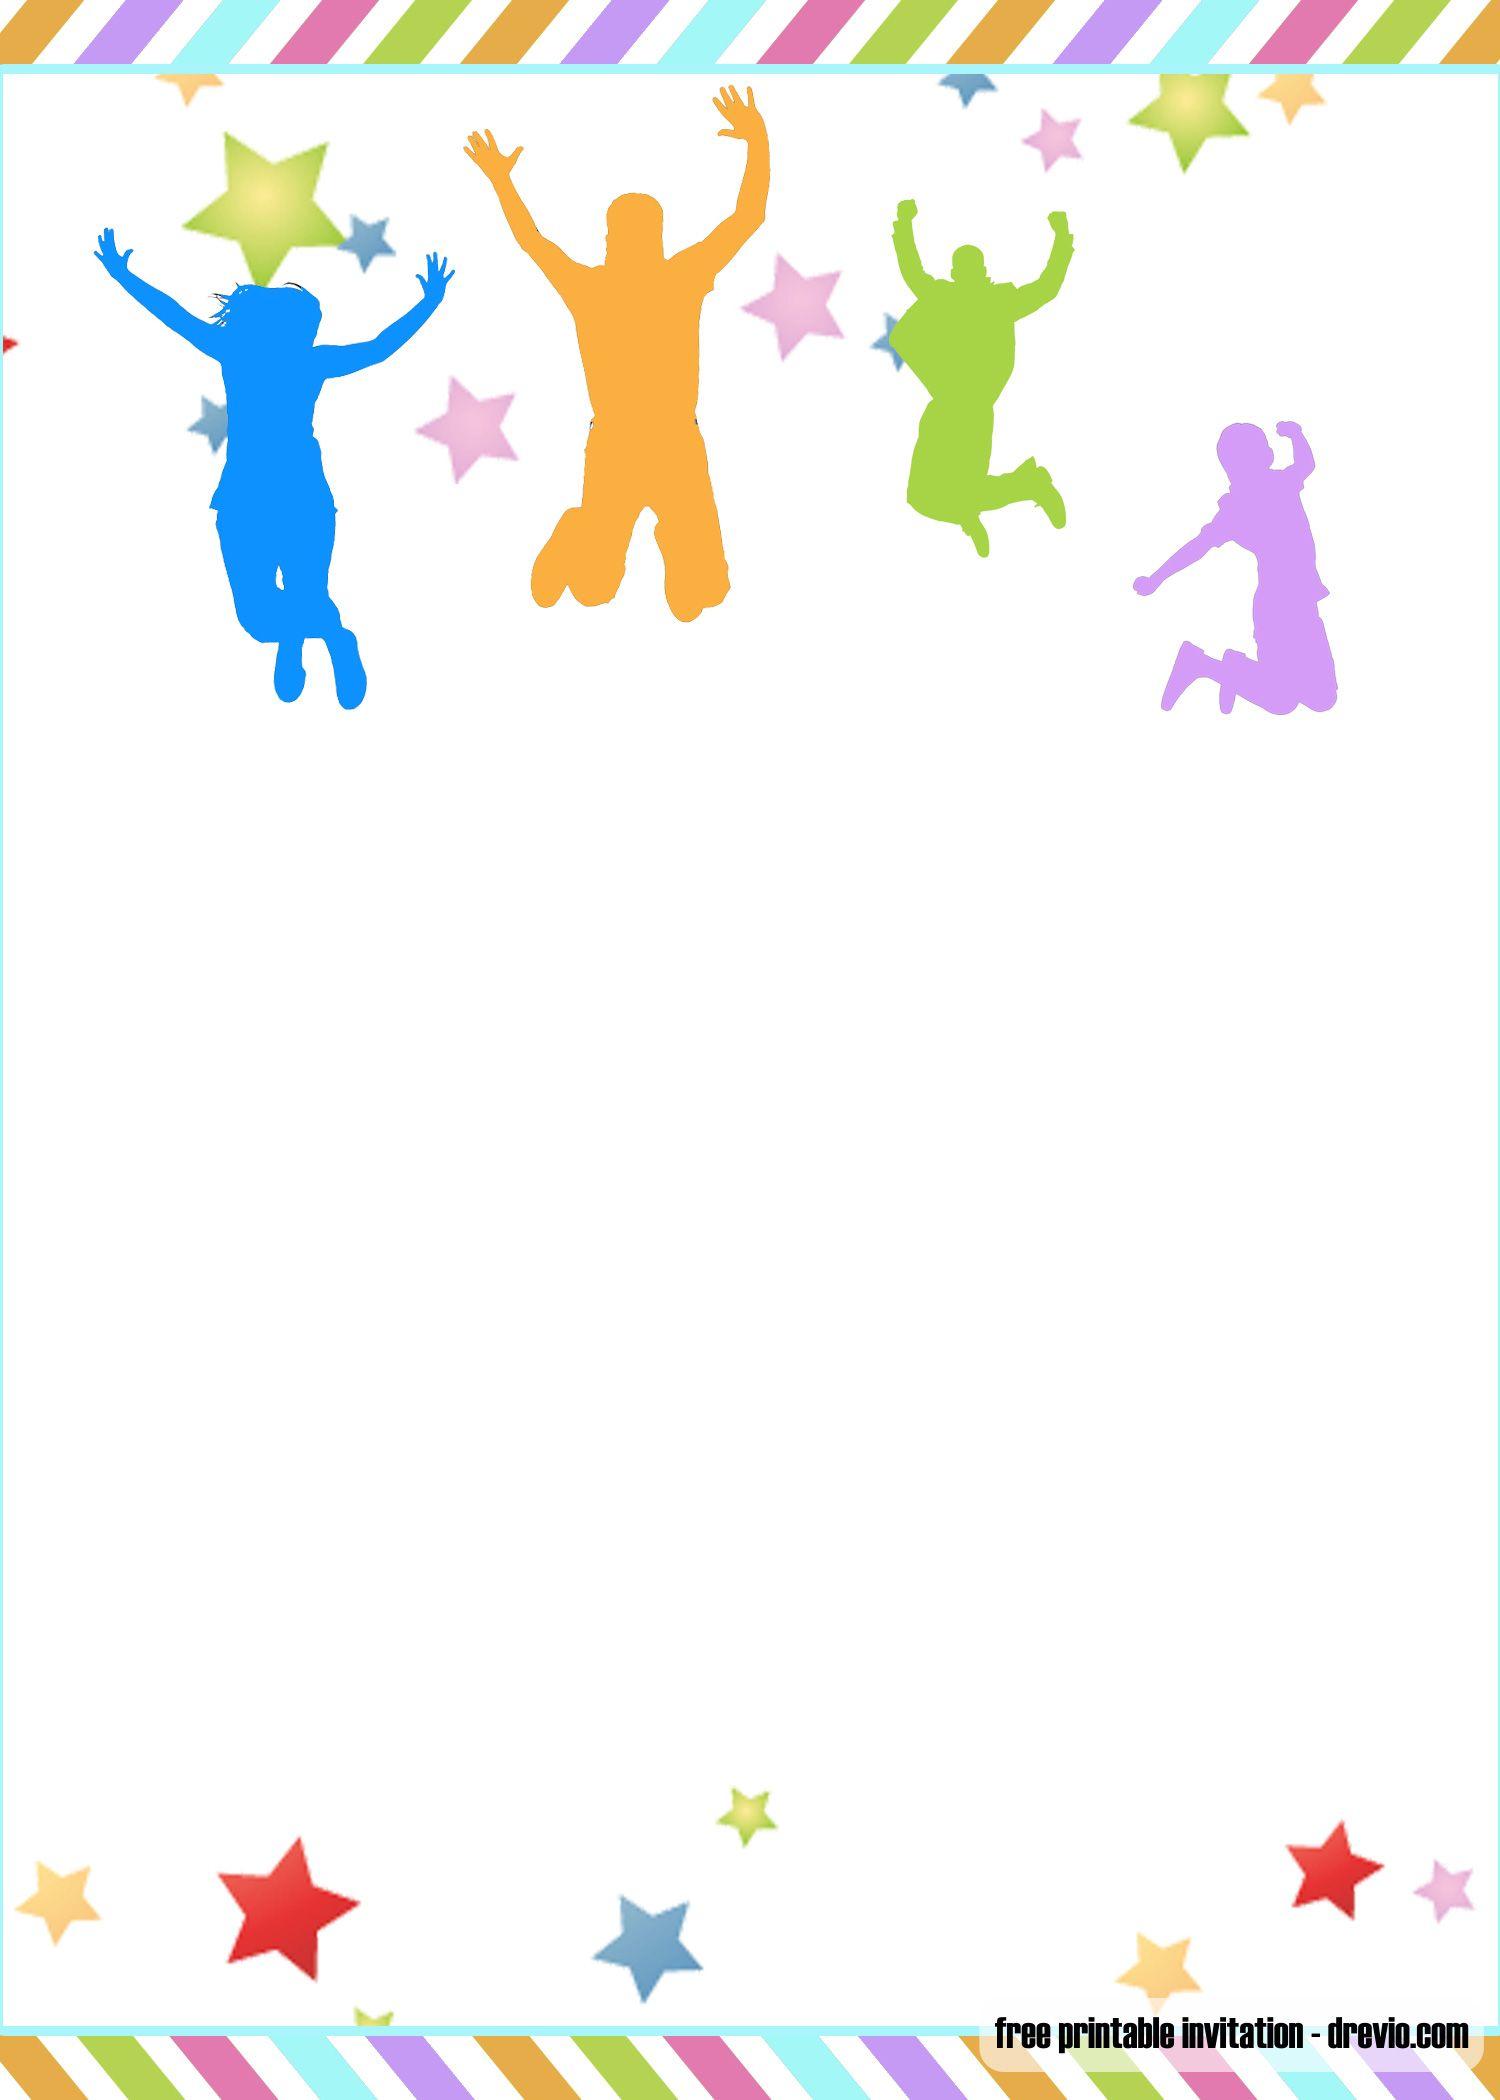 Free Printable Trampoline Jump Birthday Invitation Template Trampoline Birthday Invitations Printable Birthday Invitations Birthday Party Invitations Printable